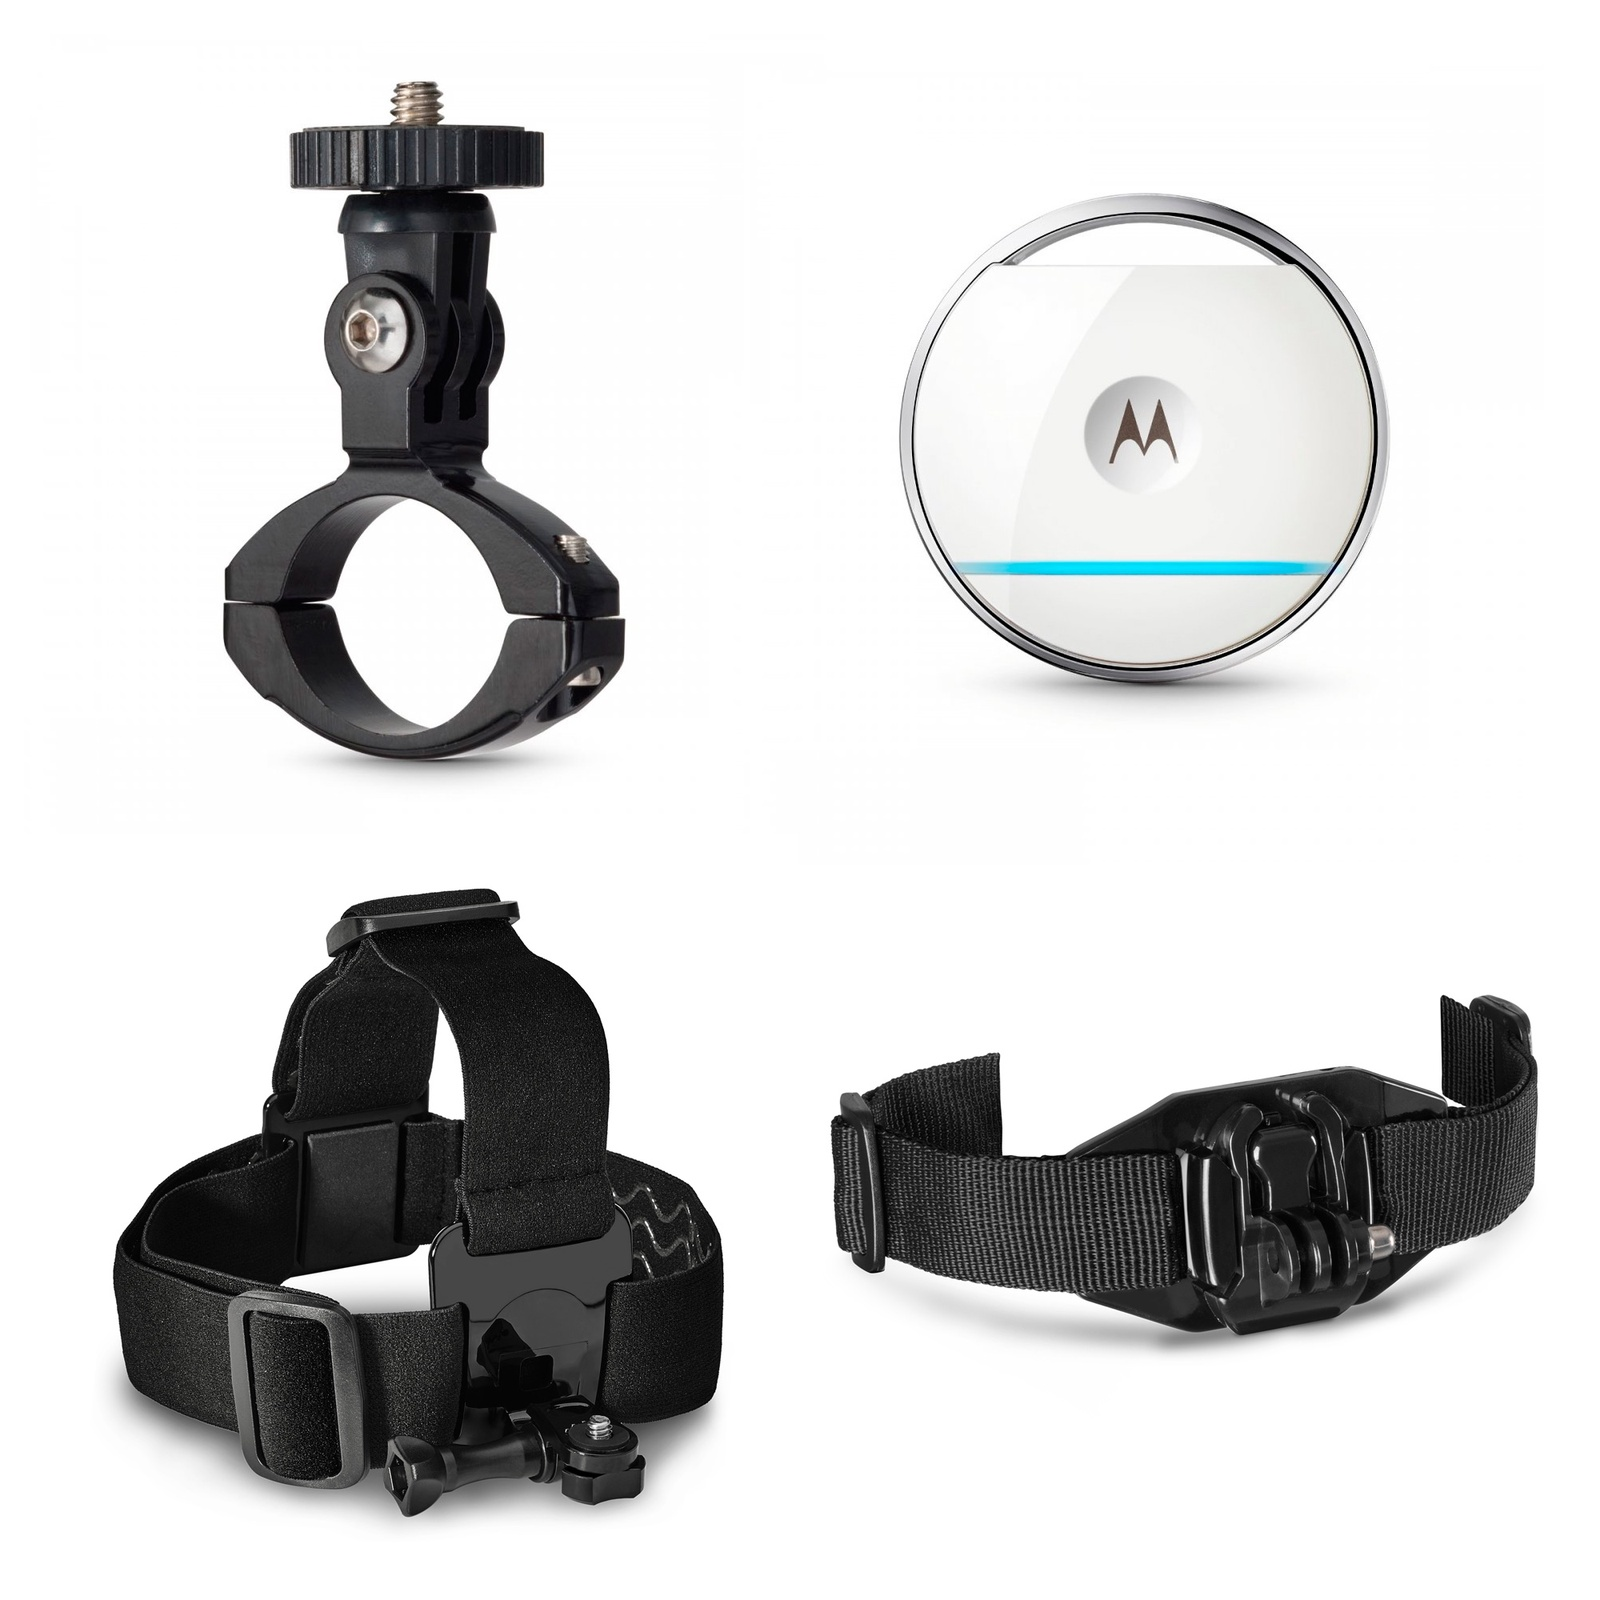 Аксессуар для экшн камеры Motorola BM034, белый цена